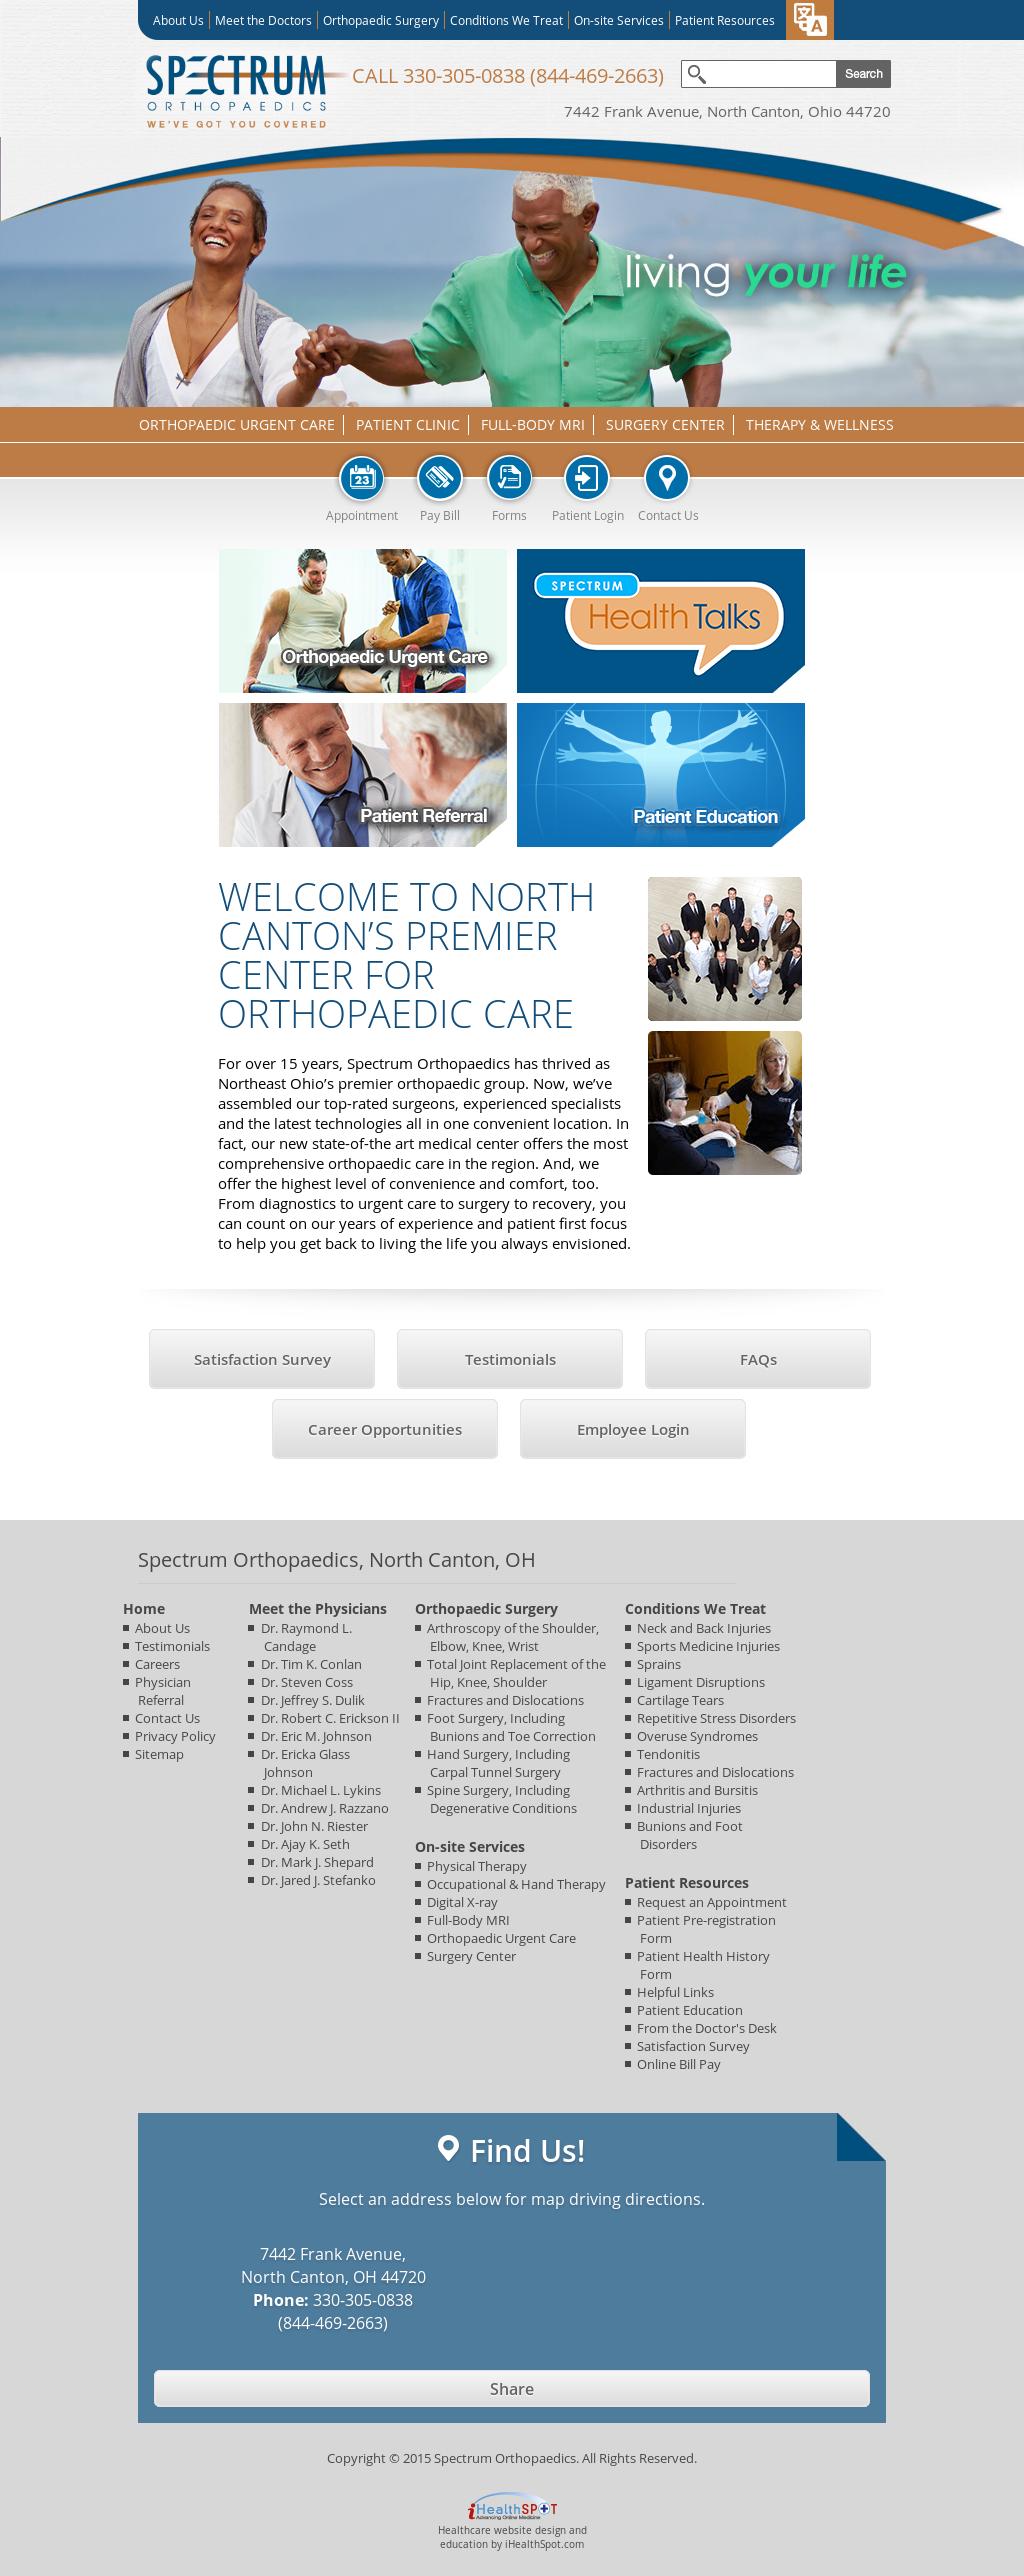 Spectrum Orthopaedics Competitors, Revenue and Employees